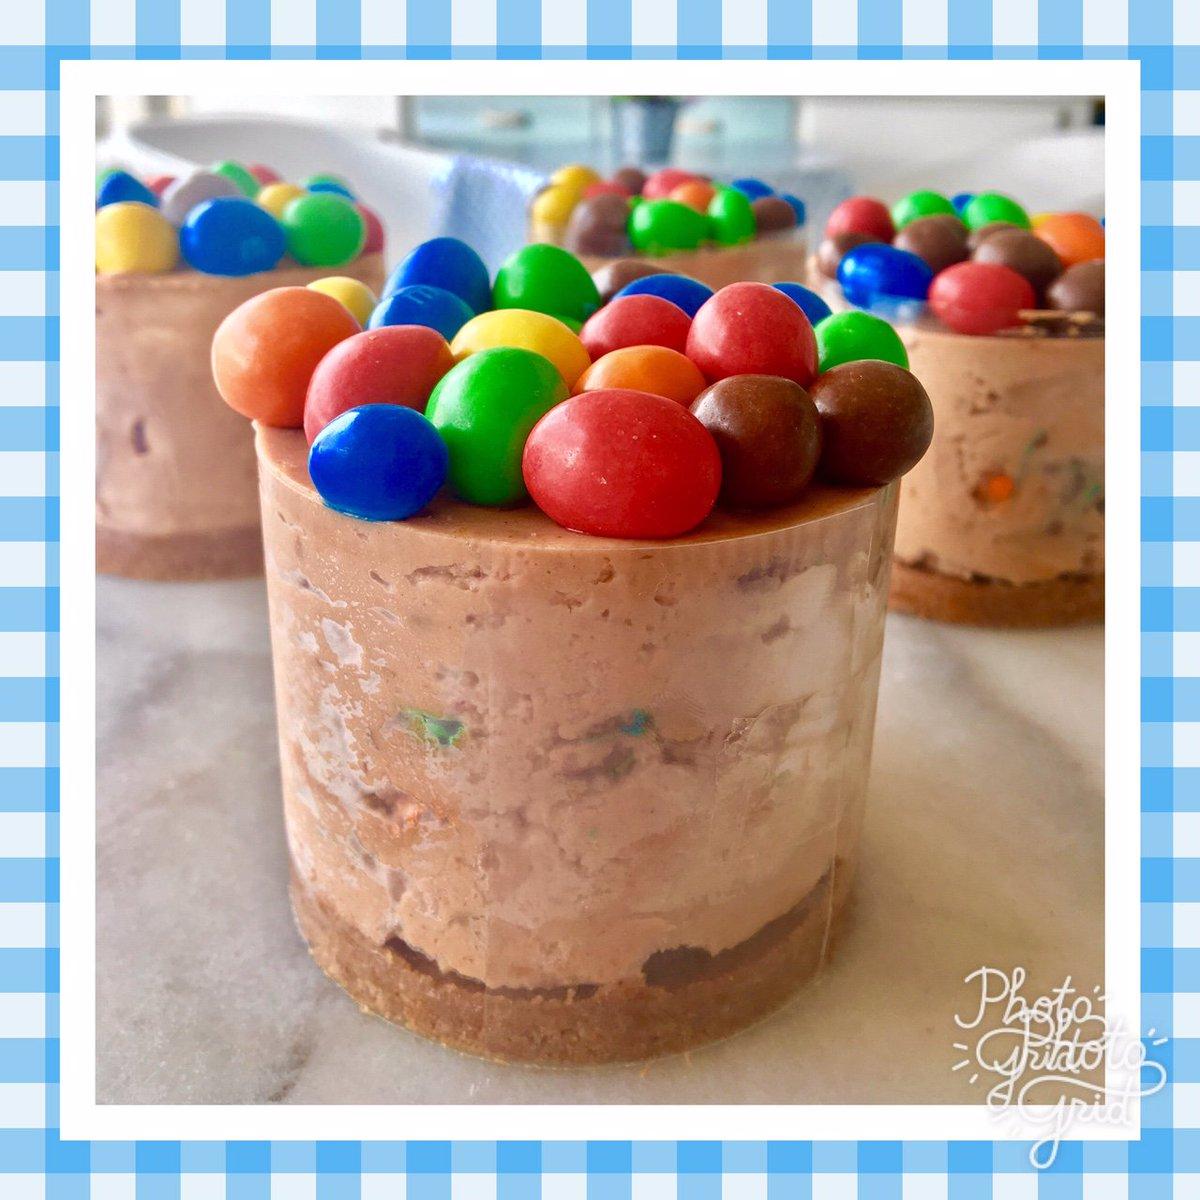 Peanut M&amp;M Cheesecakes @A_Cheesecakes #luxury #M&amp;M #cheesecake @welcomescotland @edfestival @edfringe @TrybalApp @TeamWestLothian @edinburgh<br>http://pic.twitter.com/5tVwXGr2pb